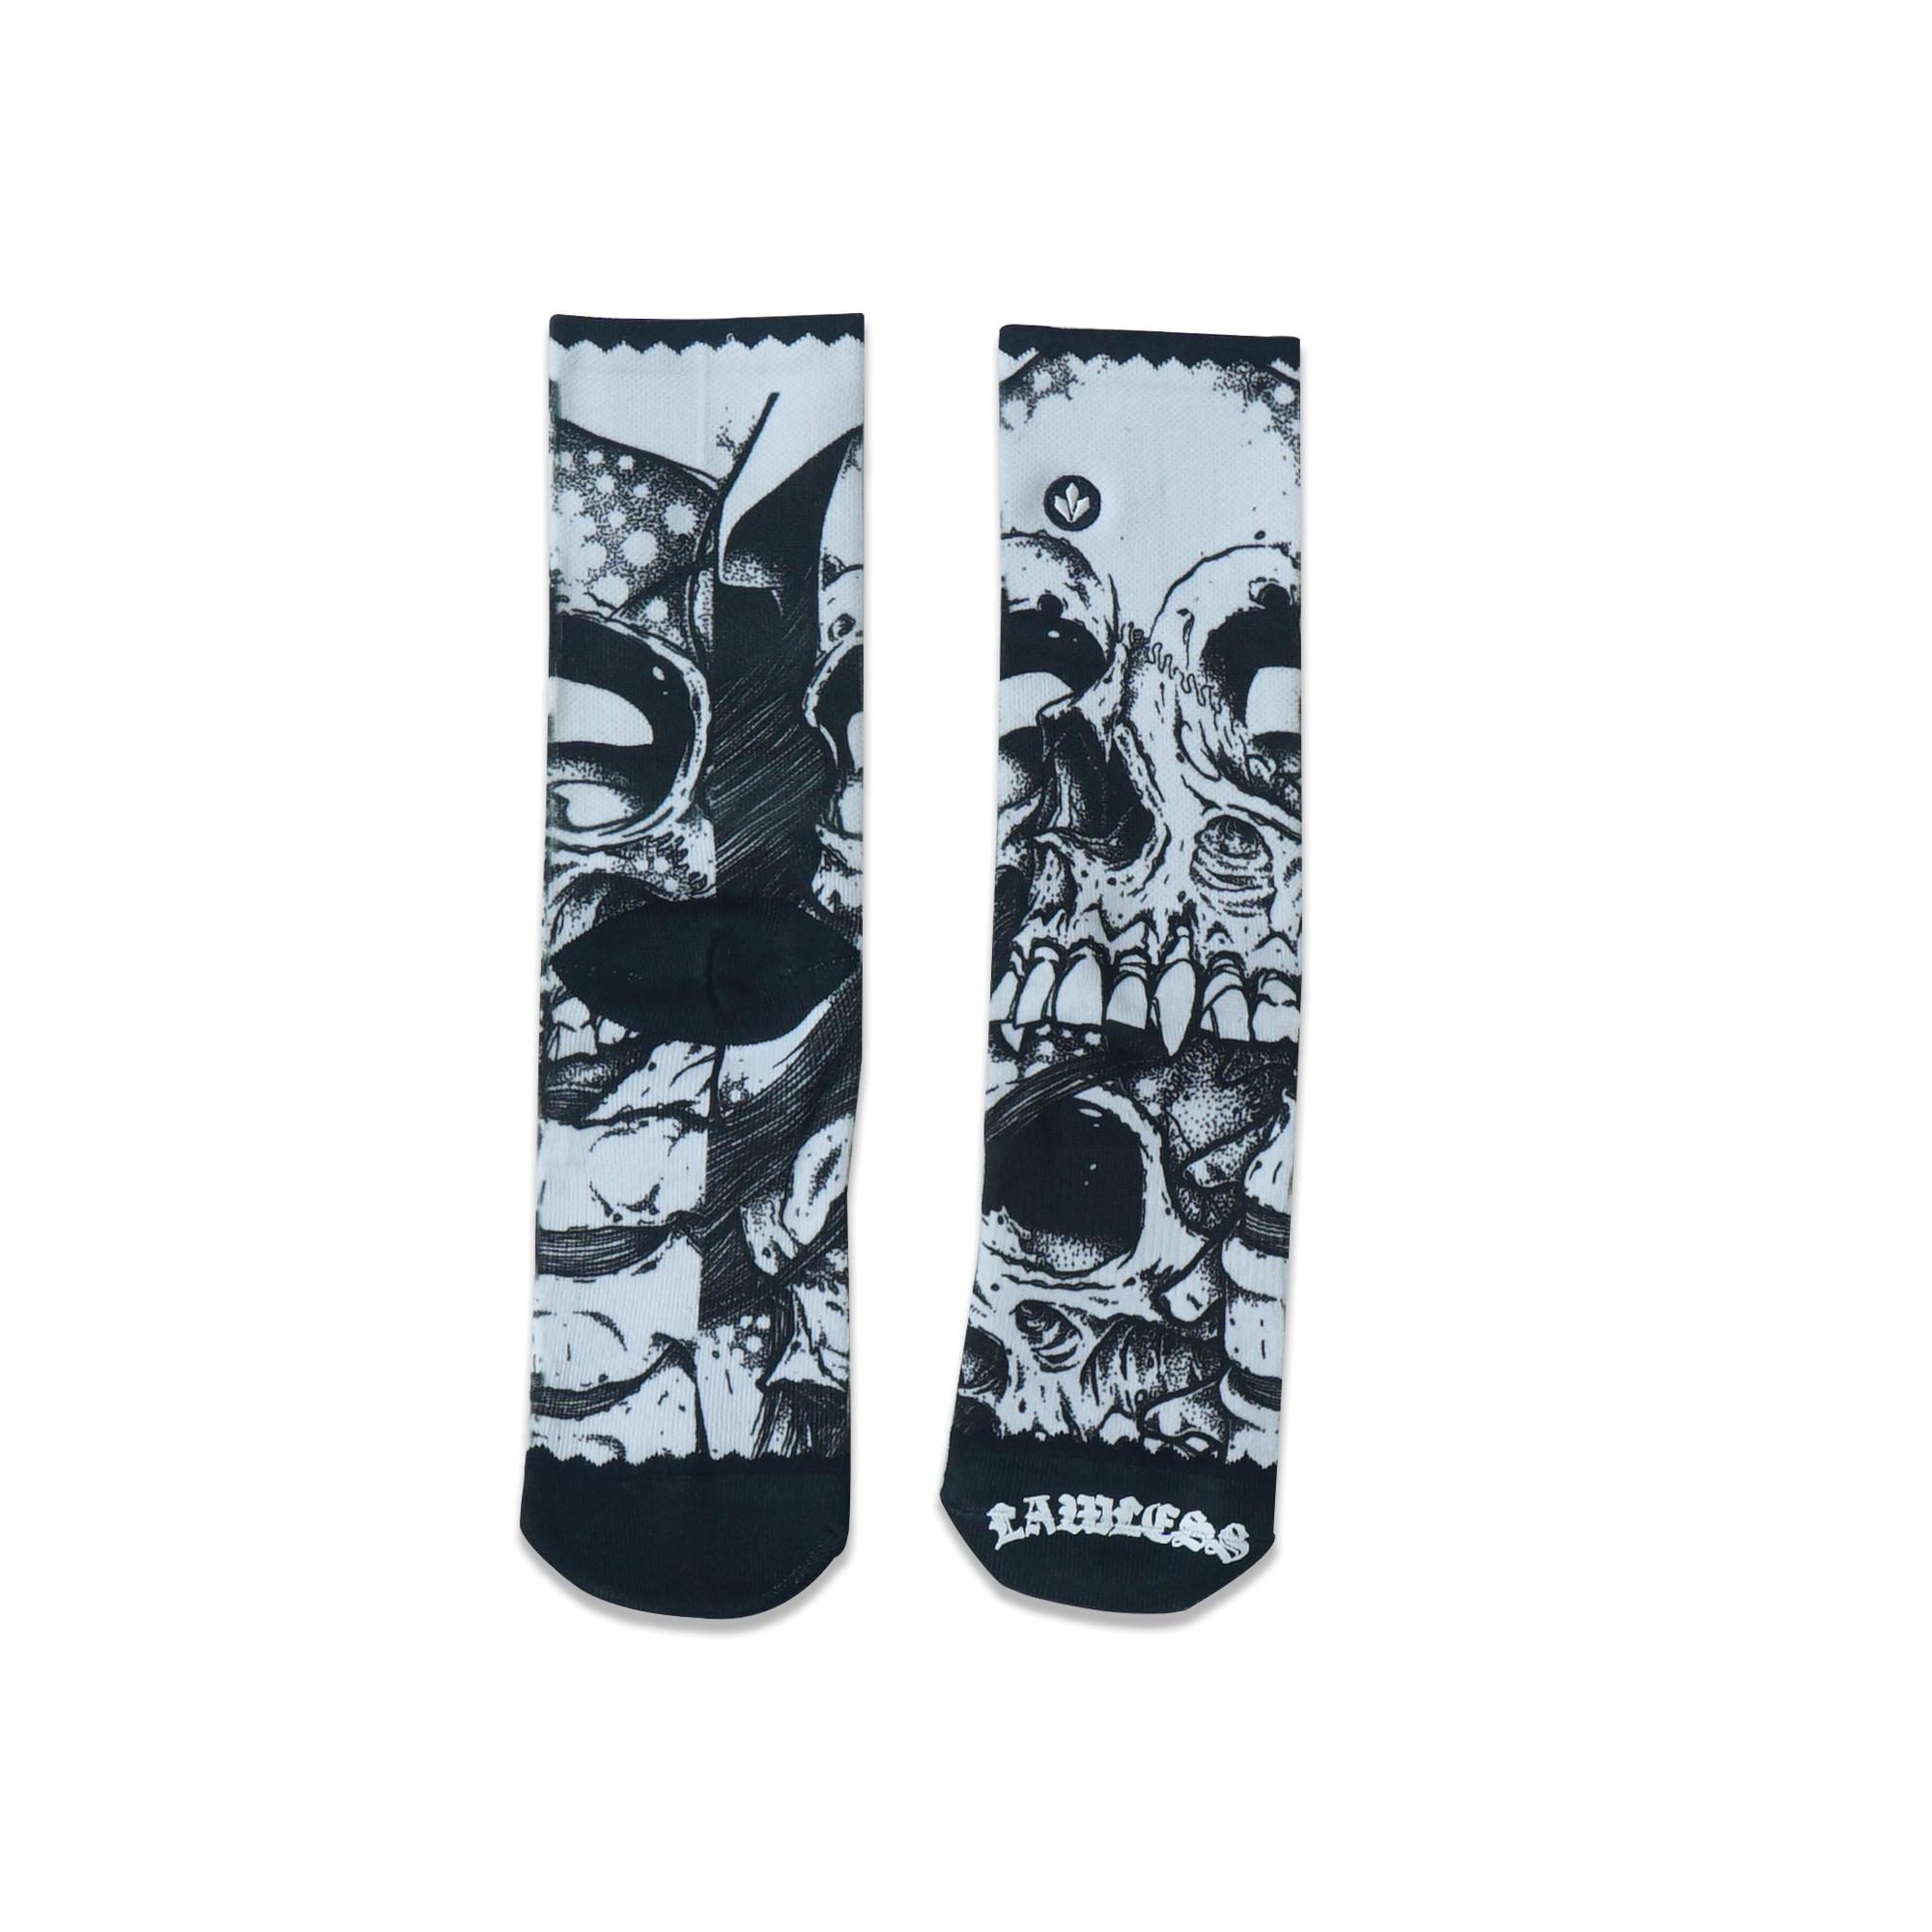 socks-lawless-x-staycool-lamort